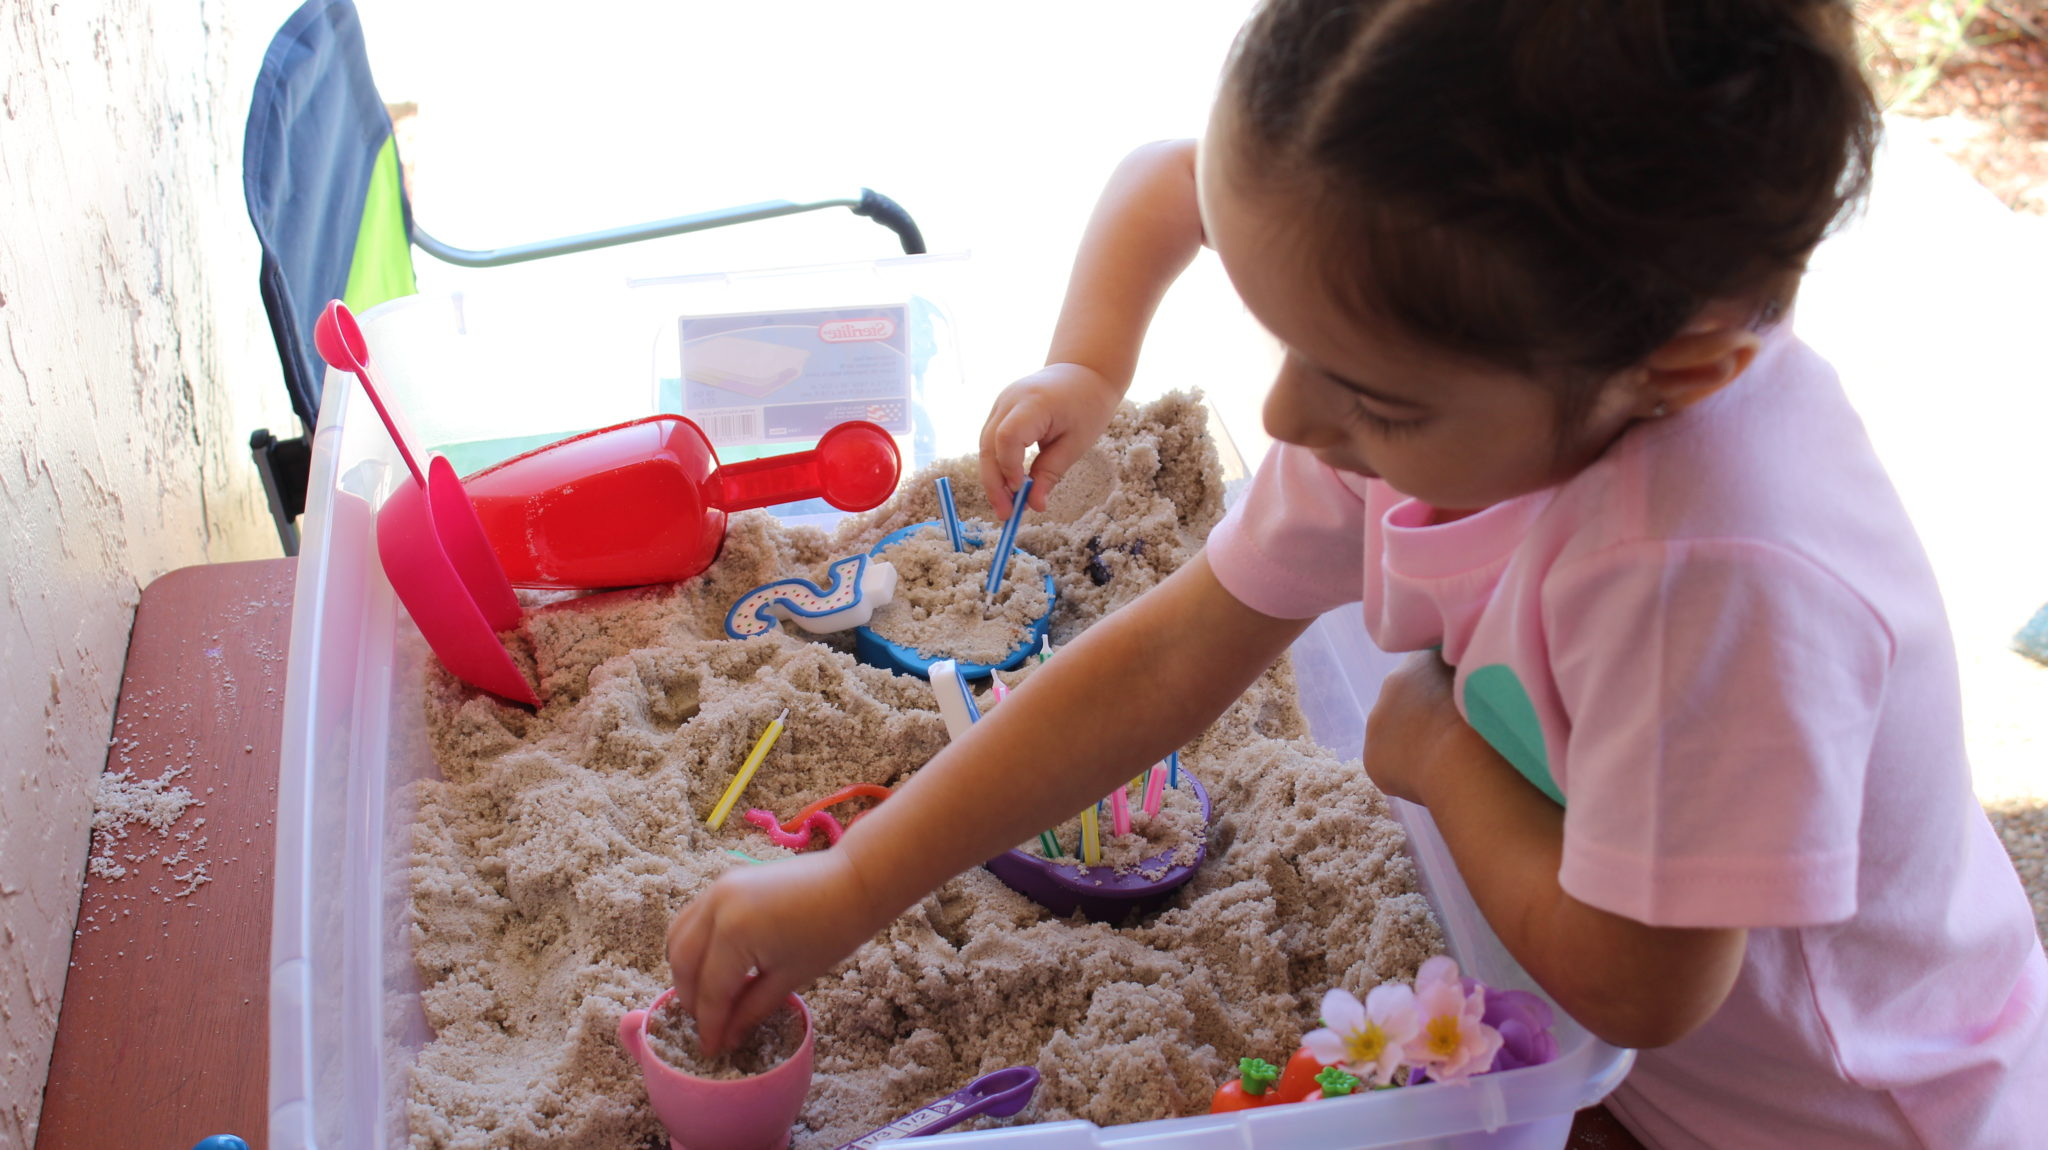 Birthday Theme Sensory Bin for Toddlers